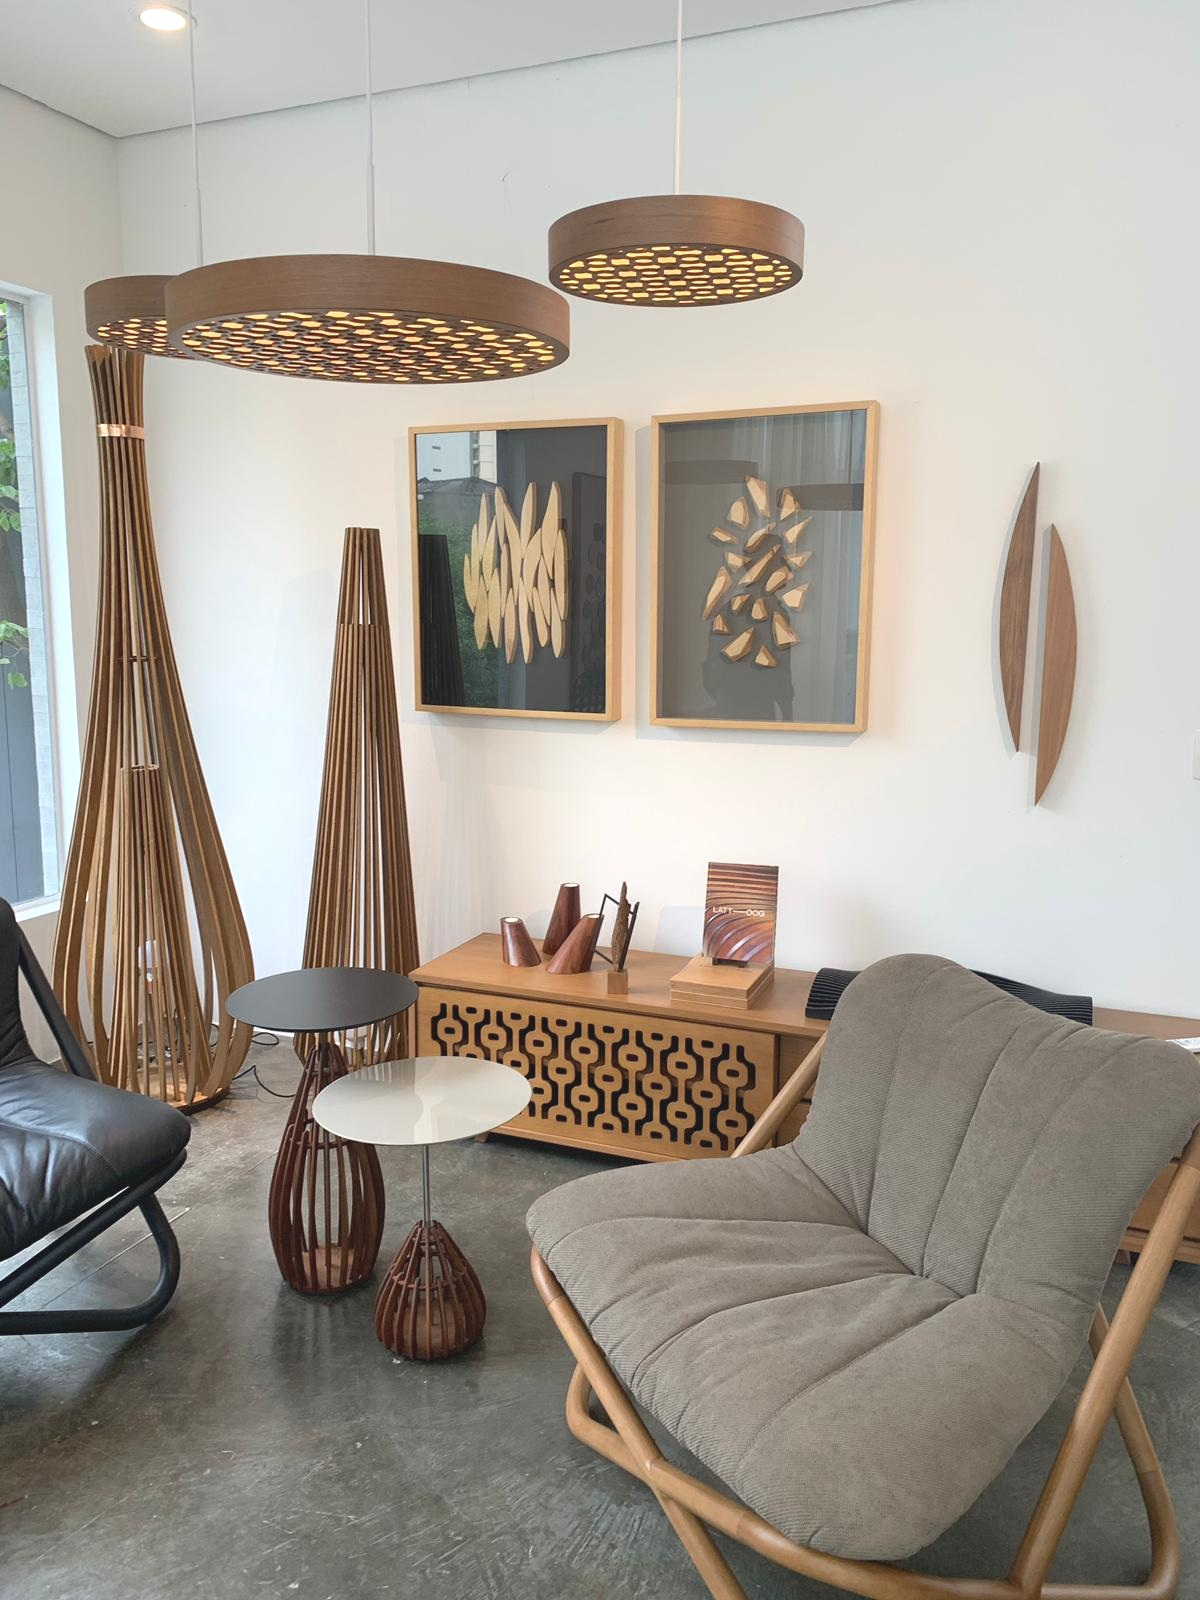 Inspiration / Lattoog, furniture and decorative elements